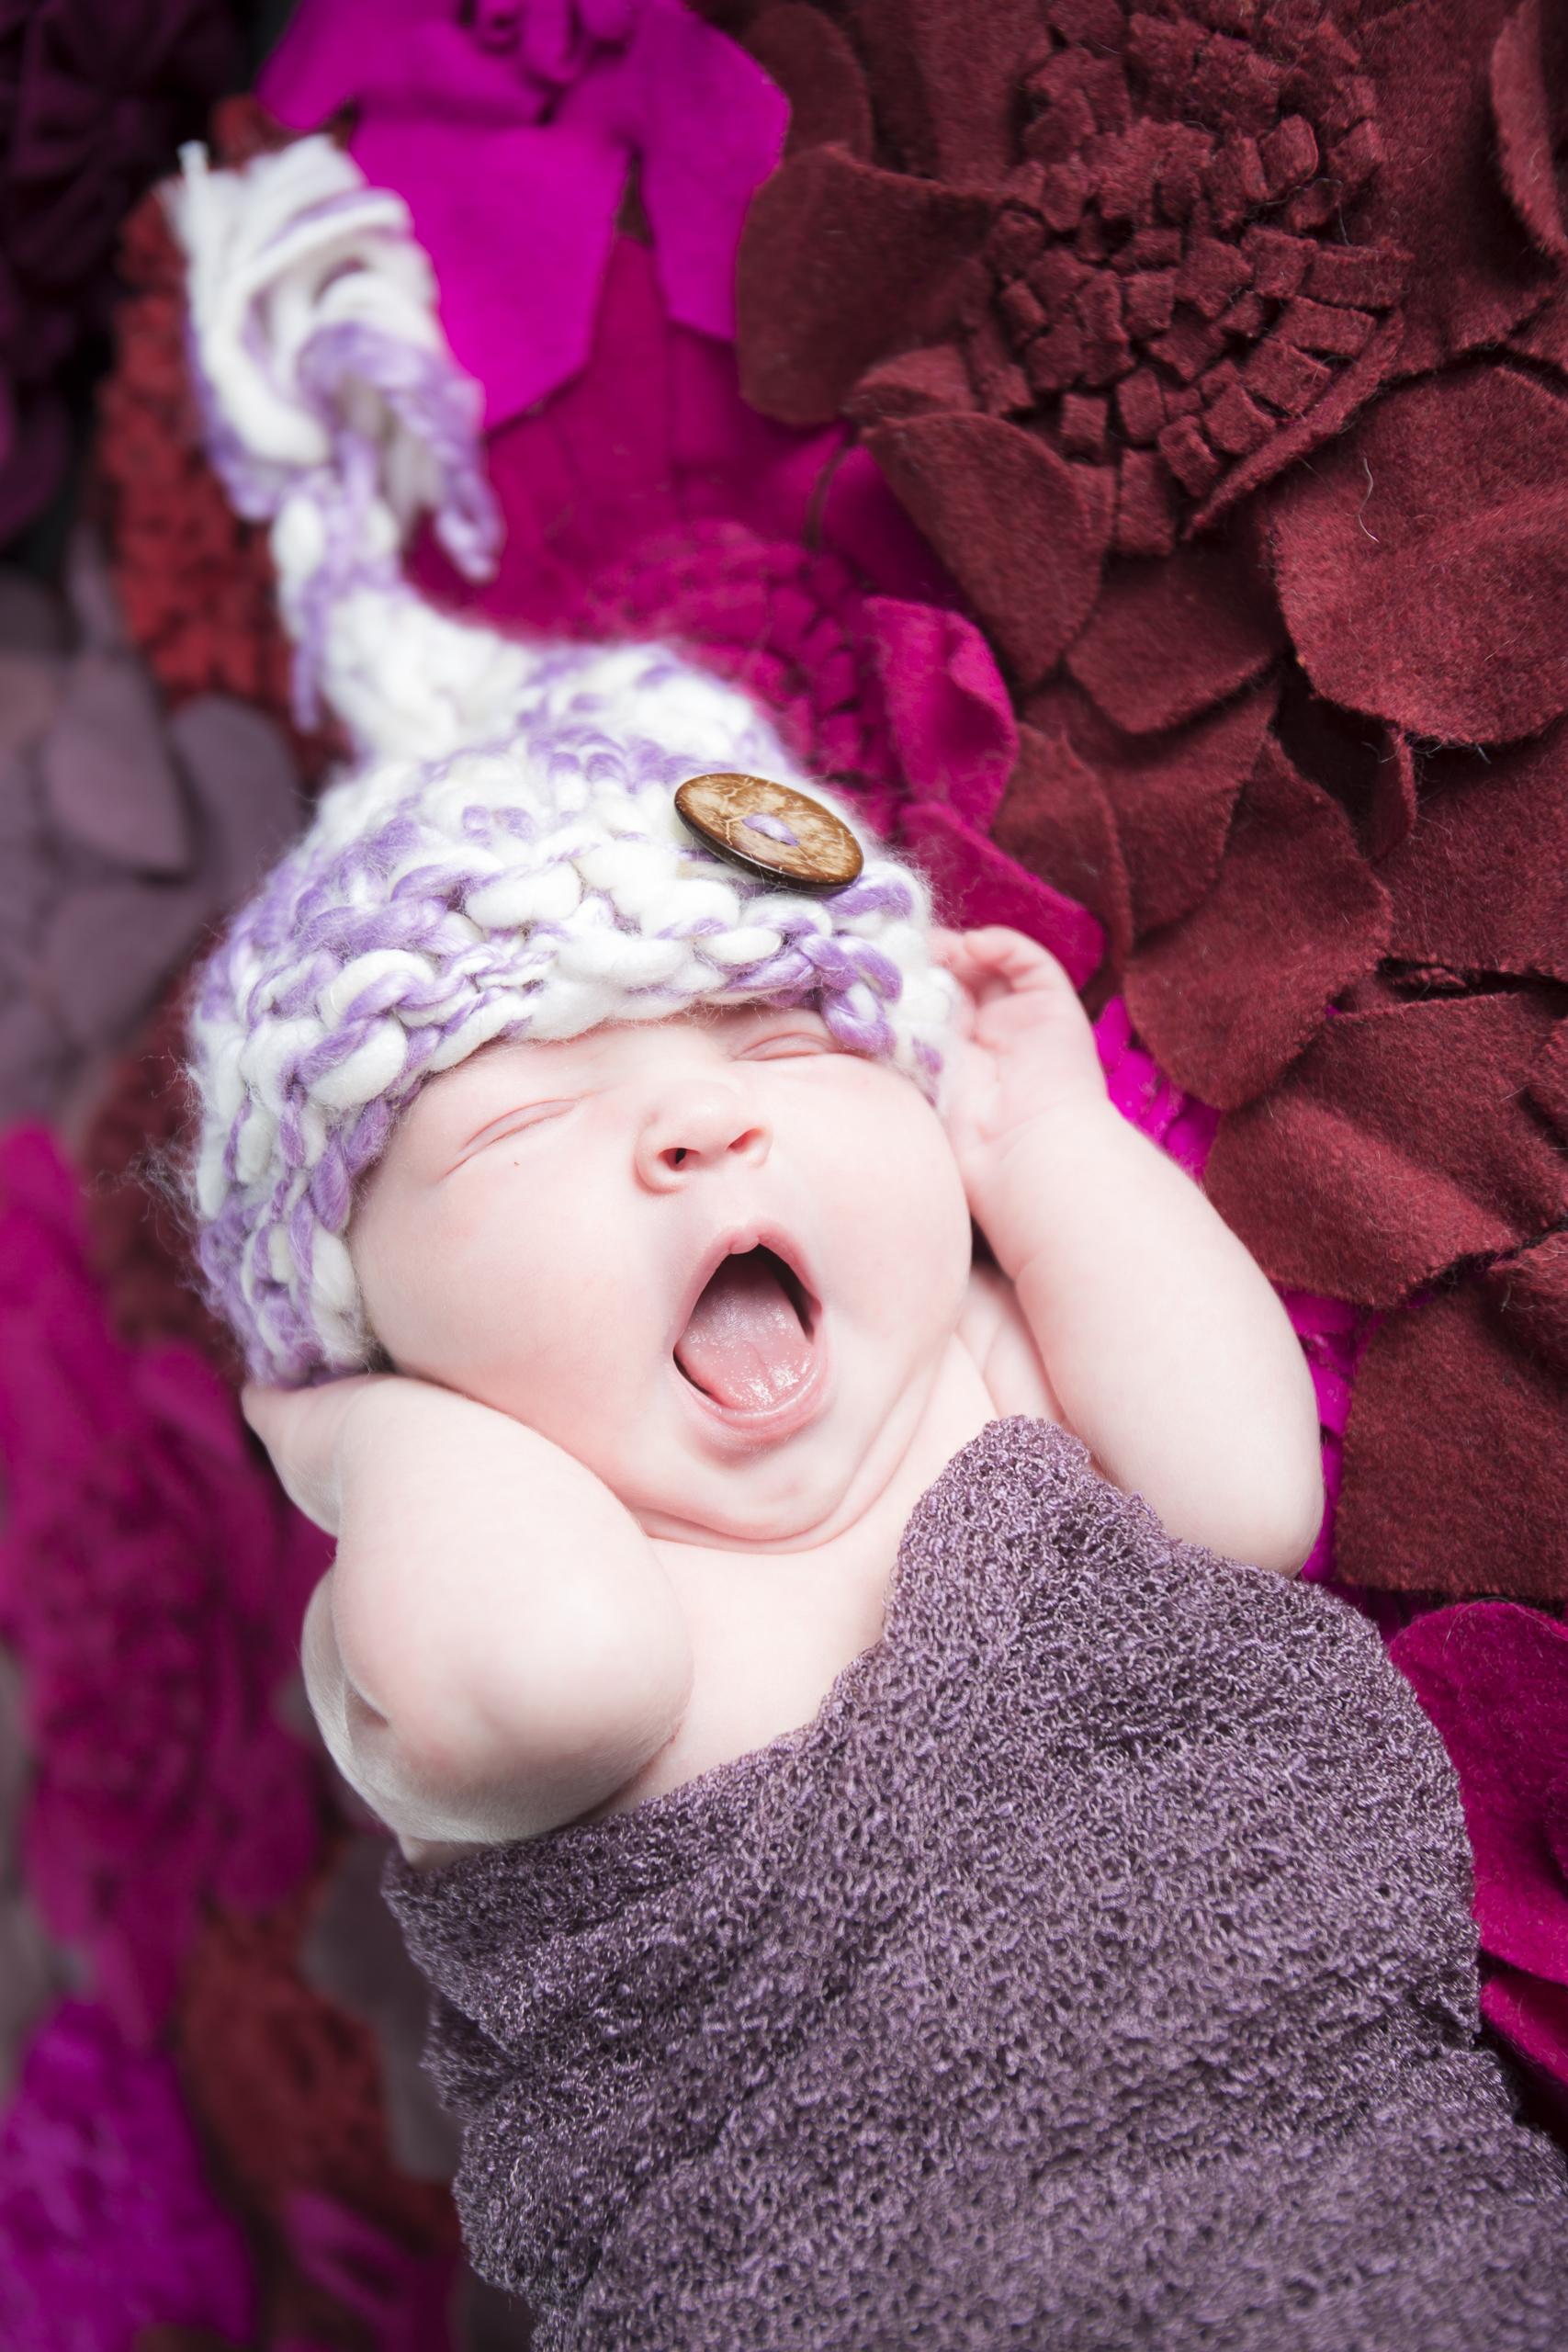 08 newborn girl purple swaddle knit hat flower felt rug studio photography session.jpg